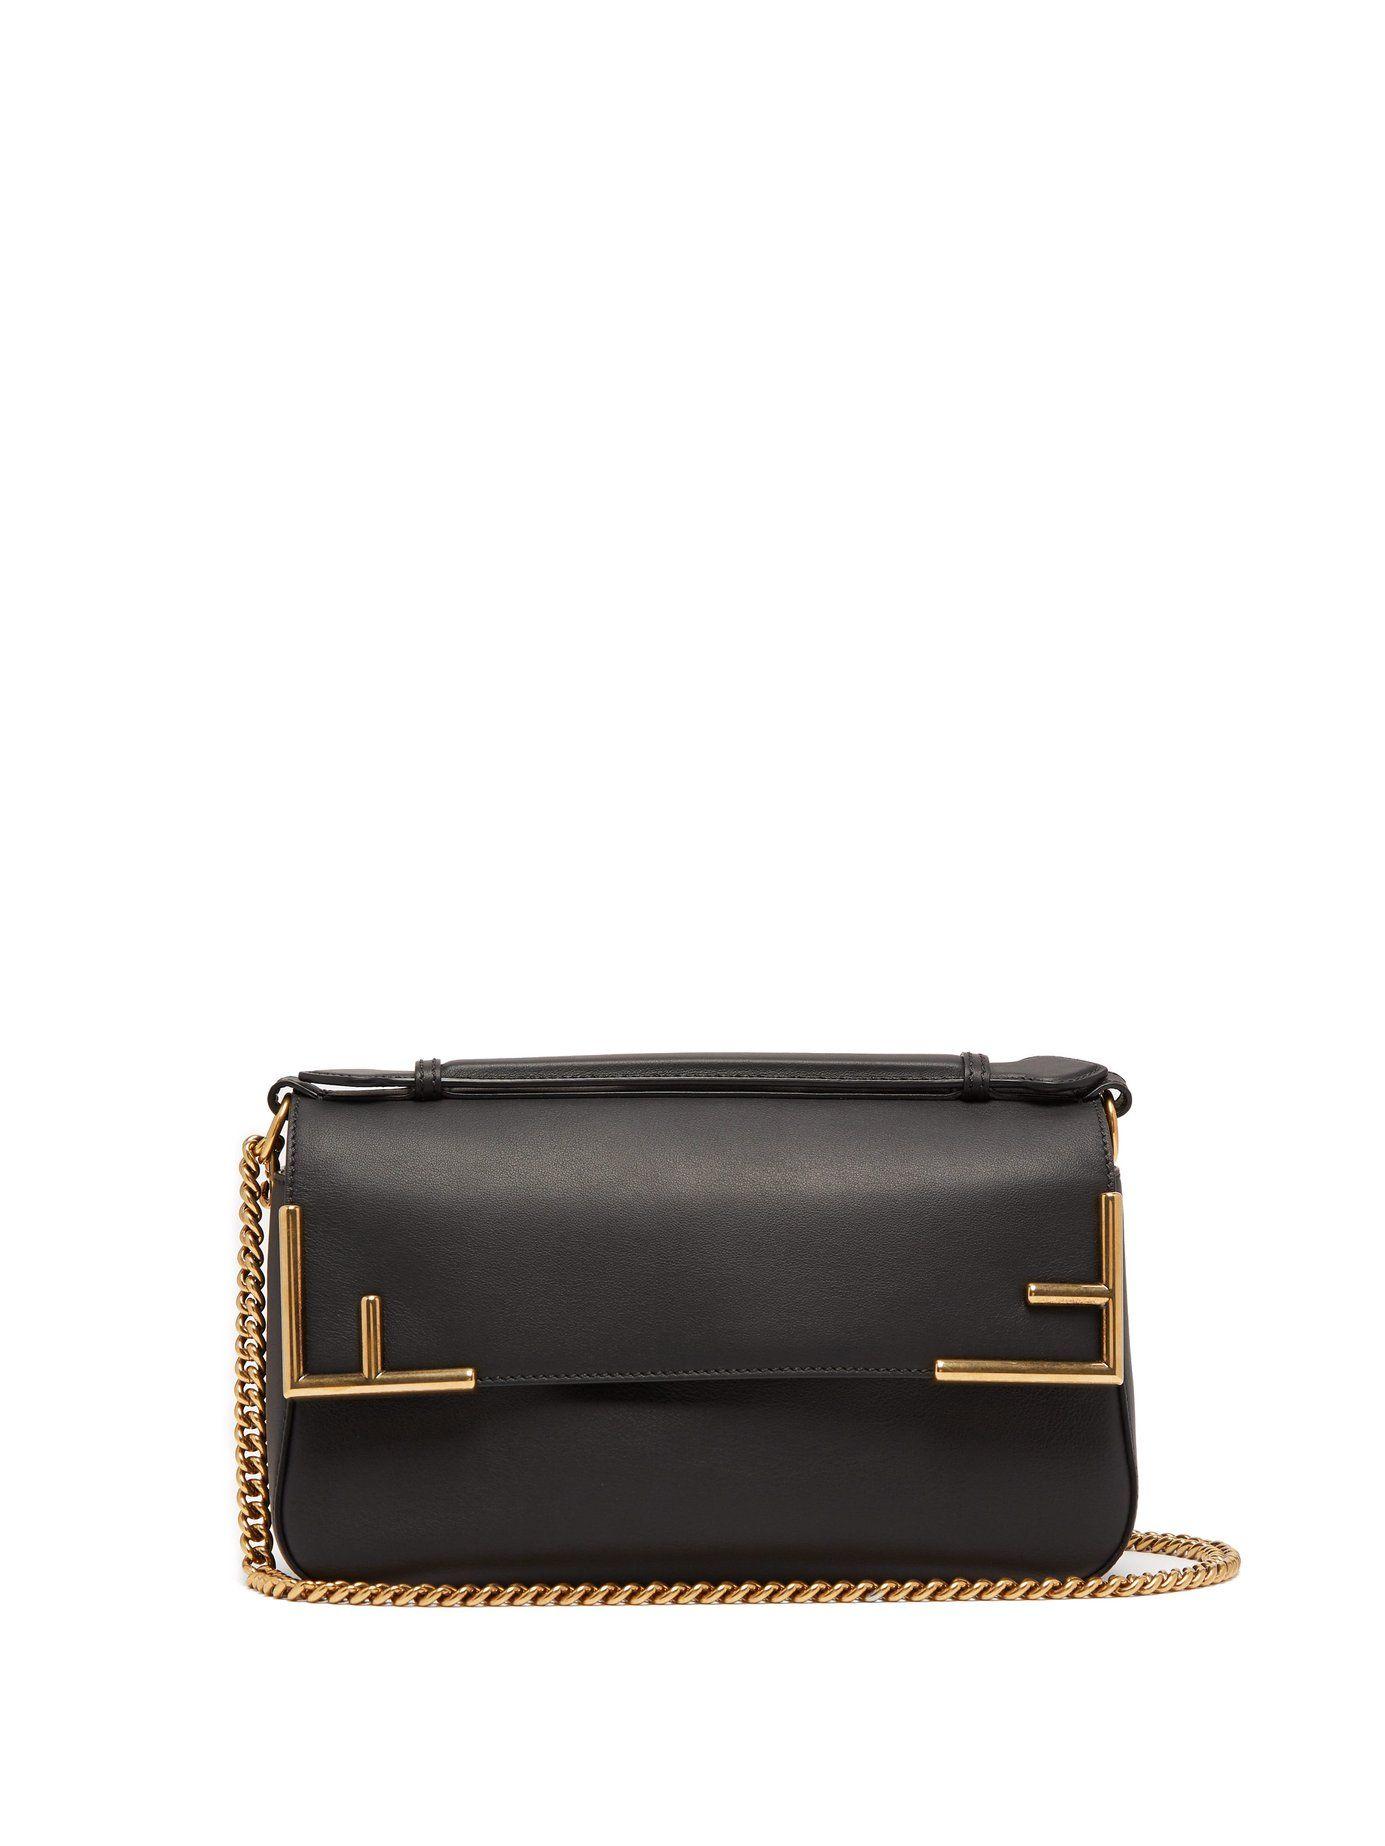 6cf41ea920ce Double F leather baguette bag